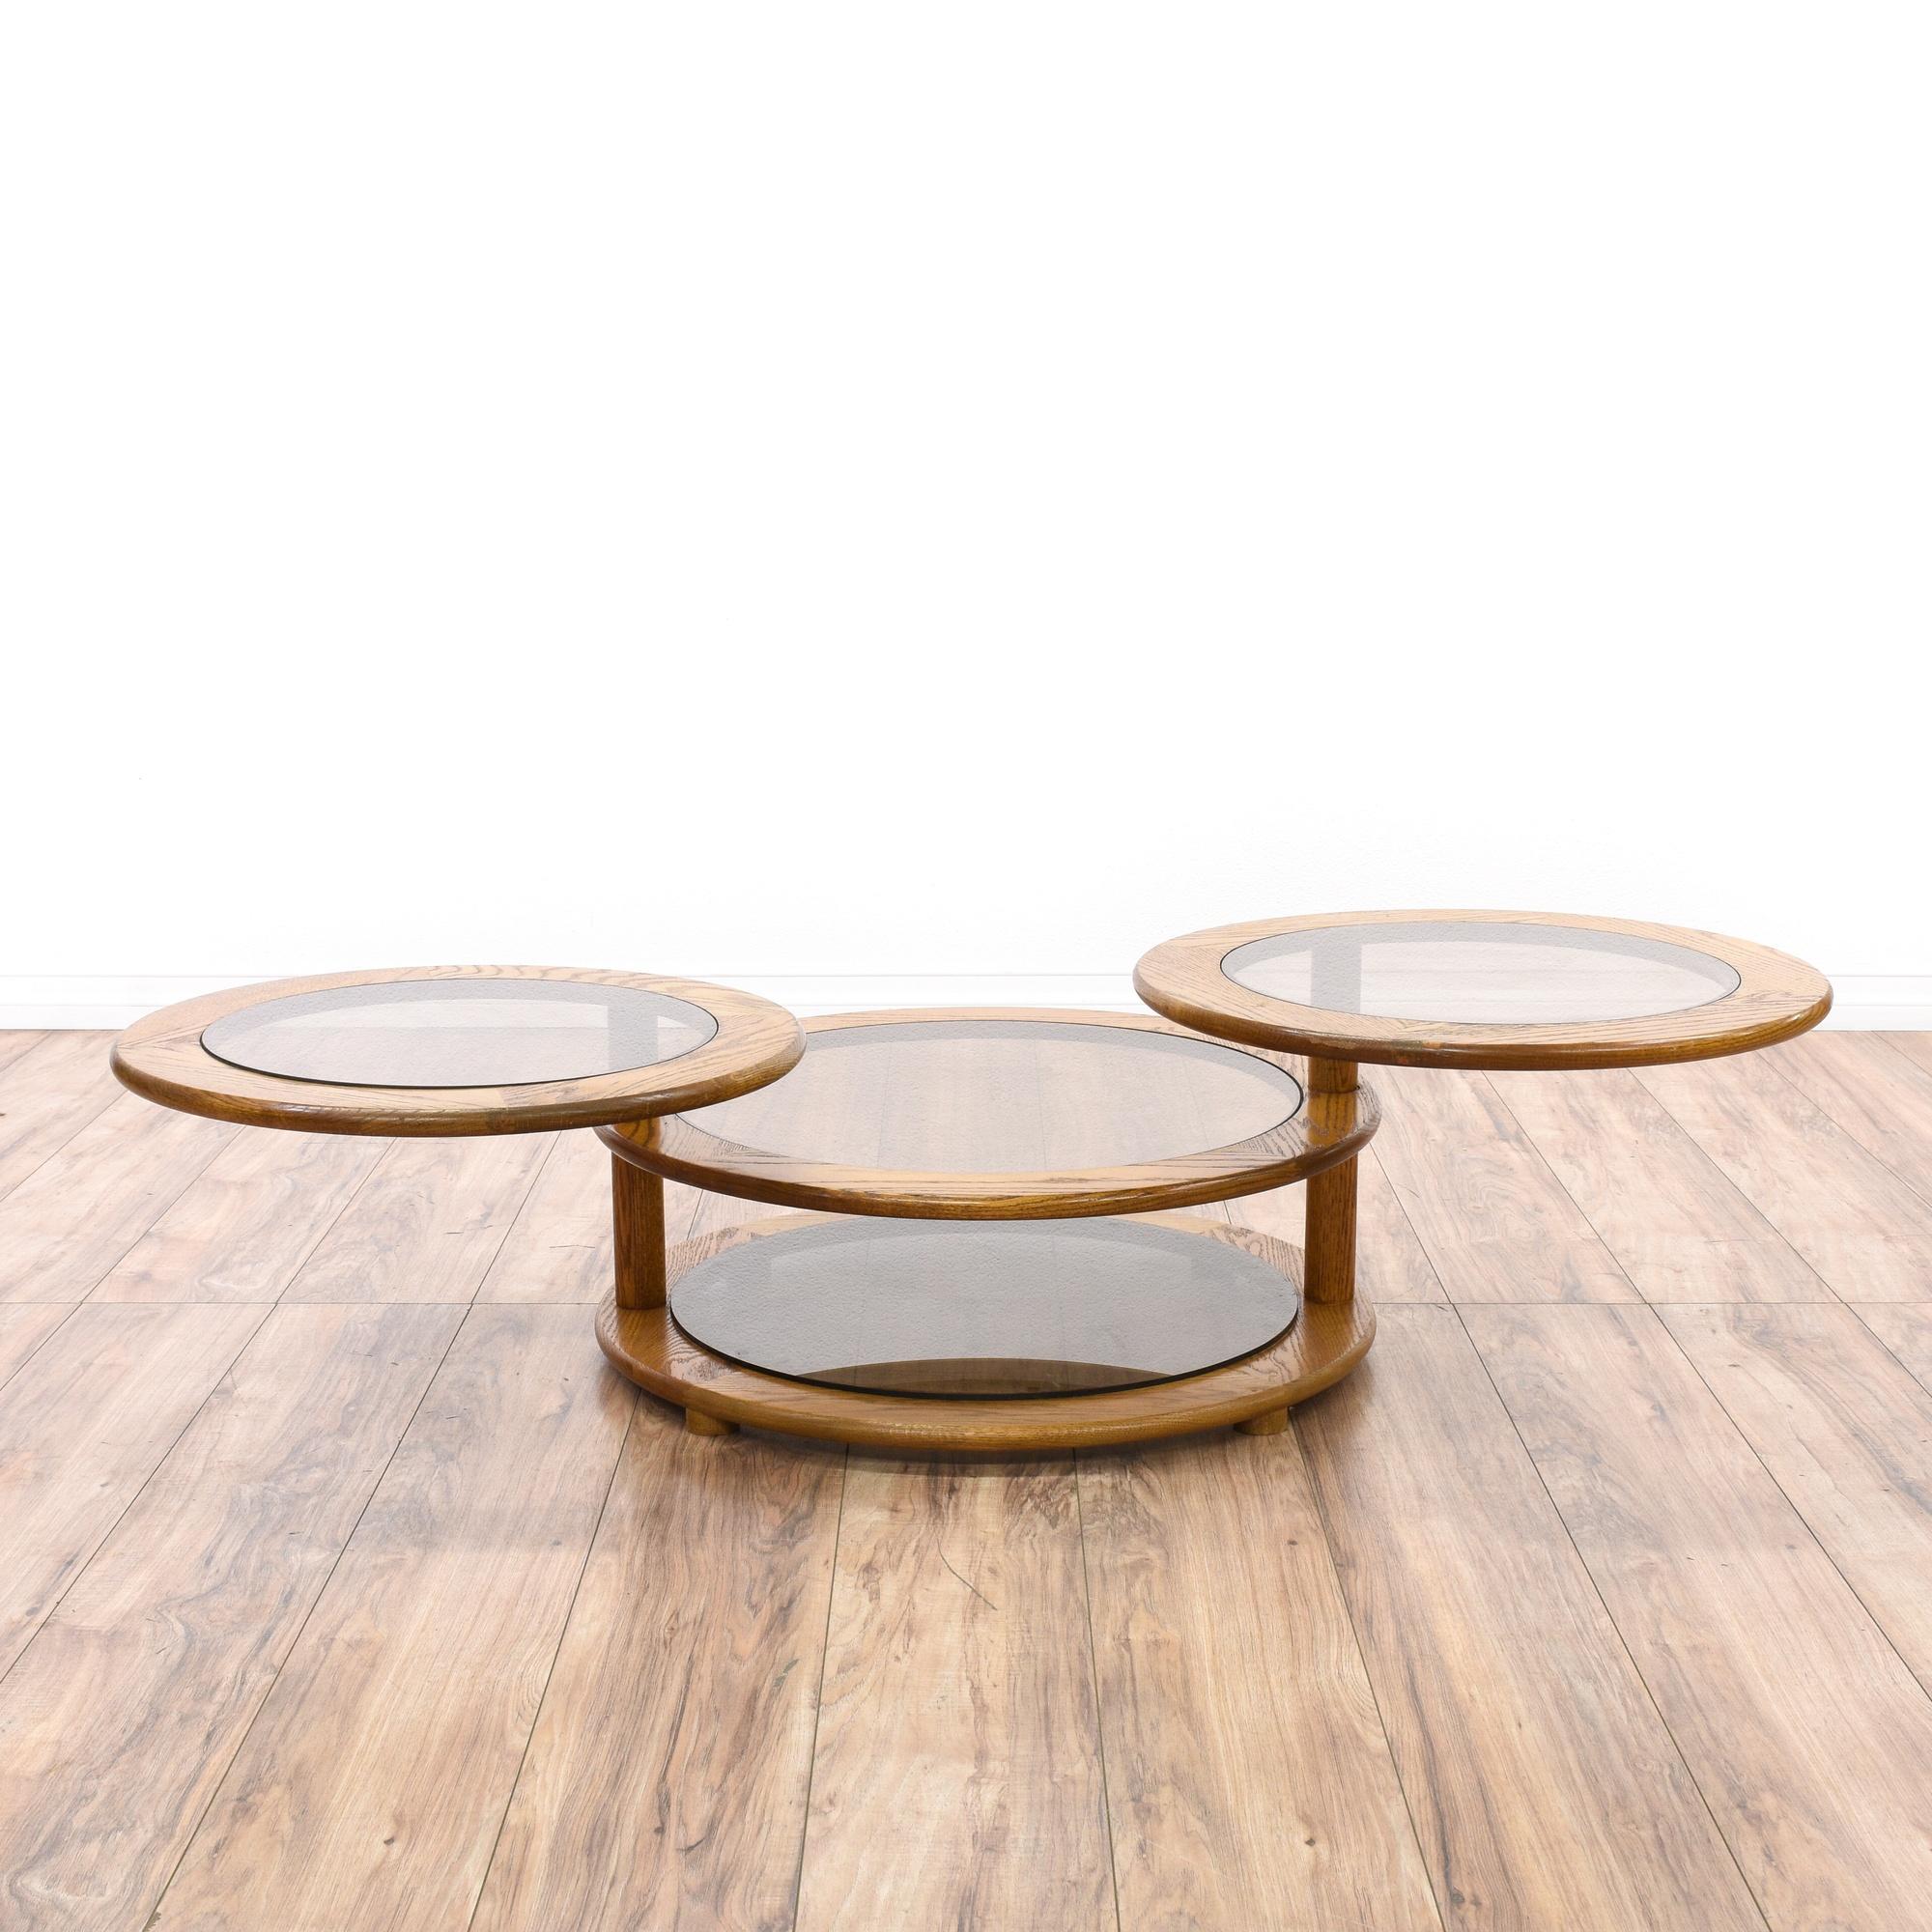 Coffee Table With Swivel: Glass & Oak Round Swivel Coffee Table